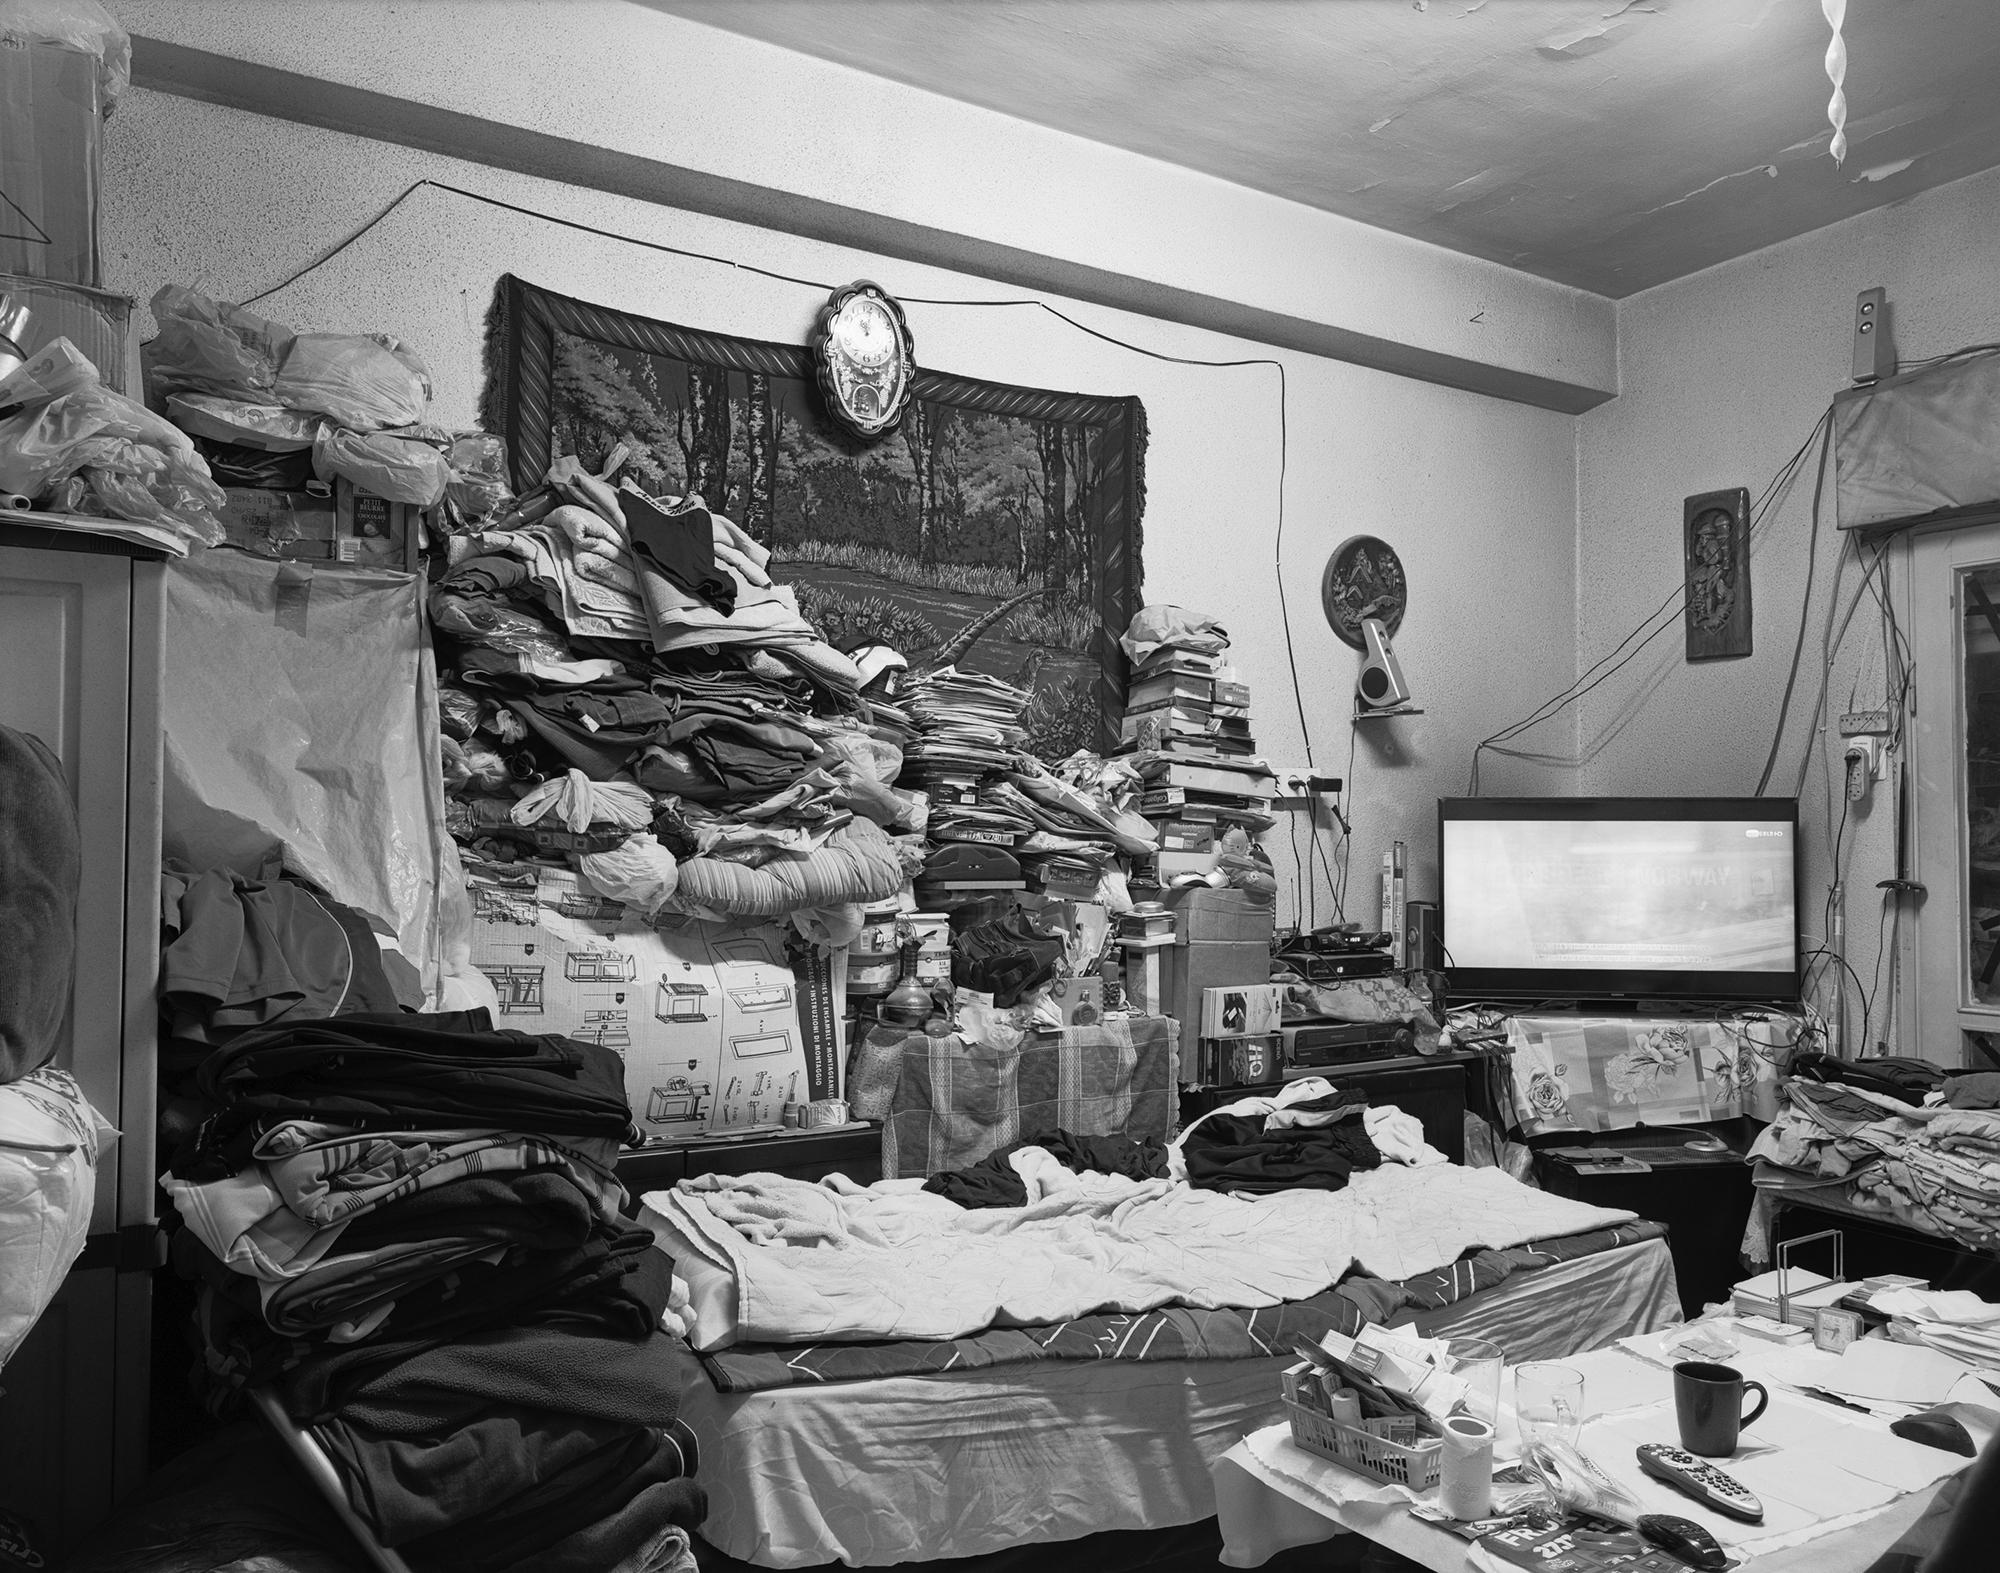 S. living room. Neve Sha'anan. 2015